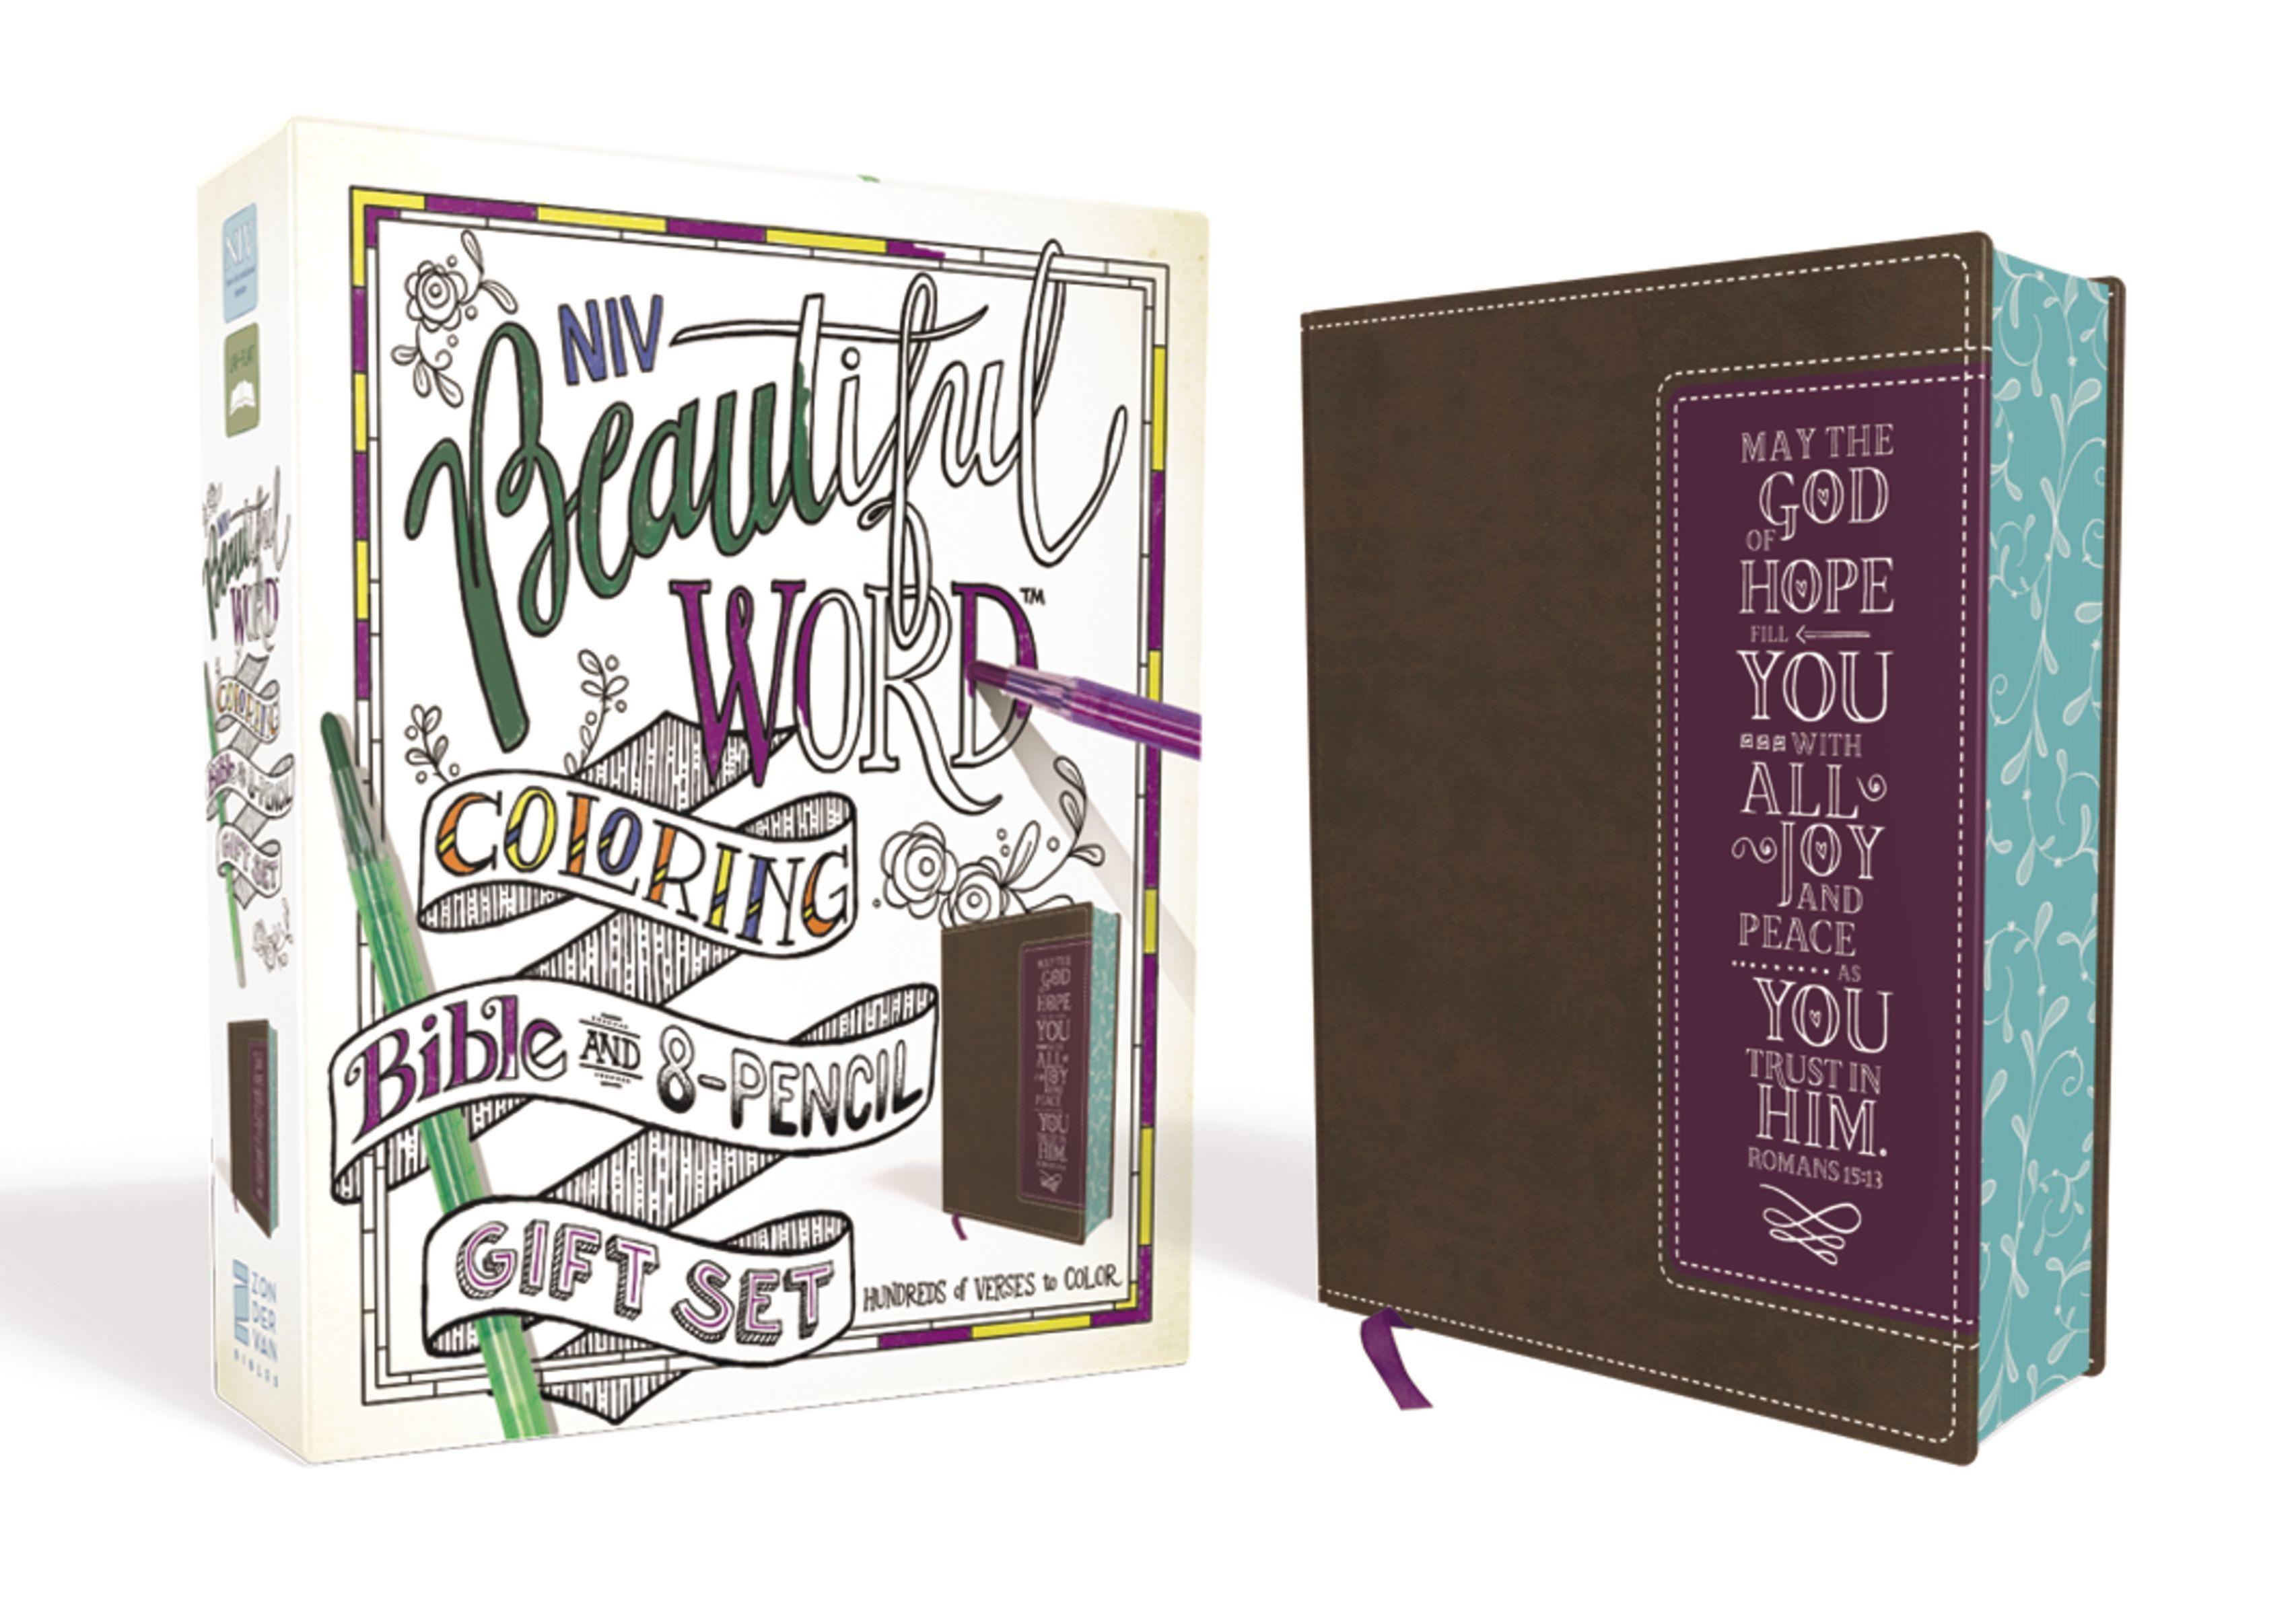 Bible a 8-pencil Gift Set